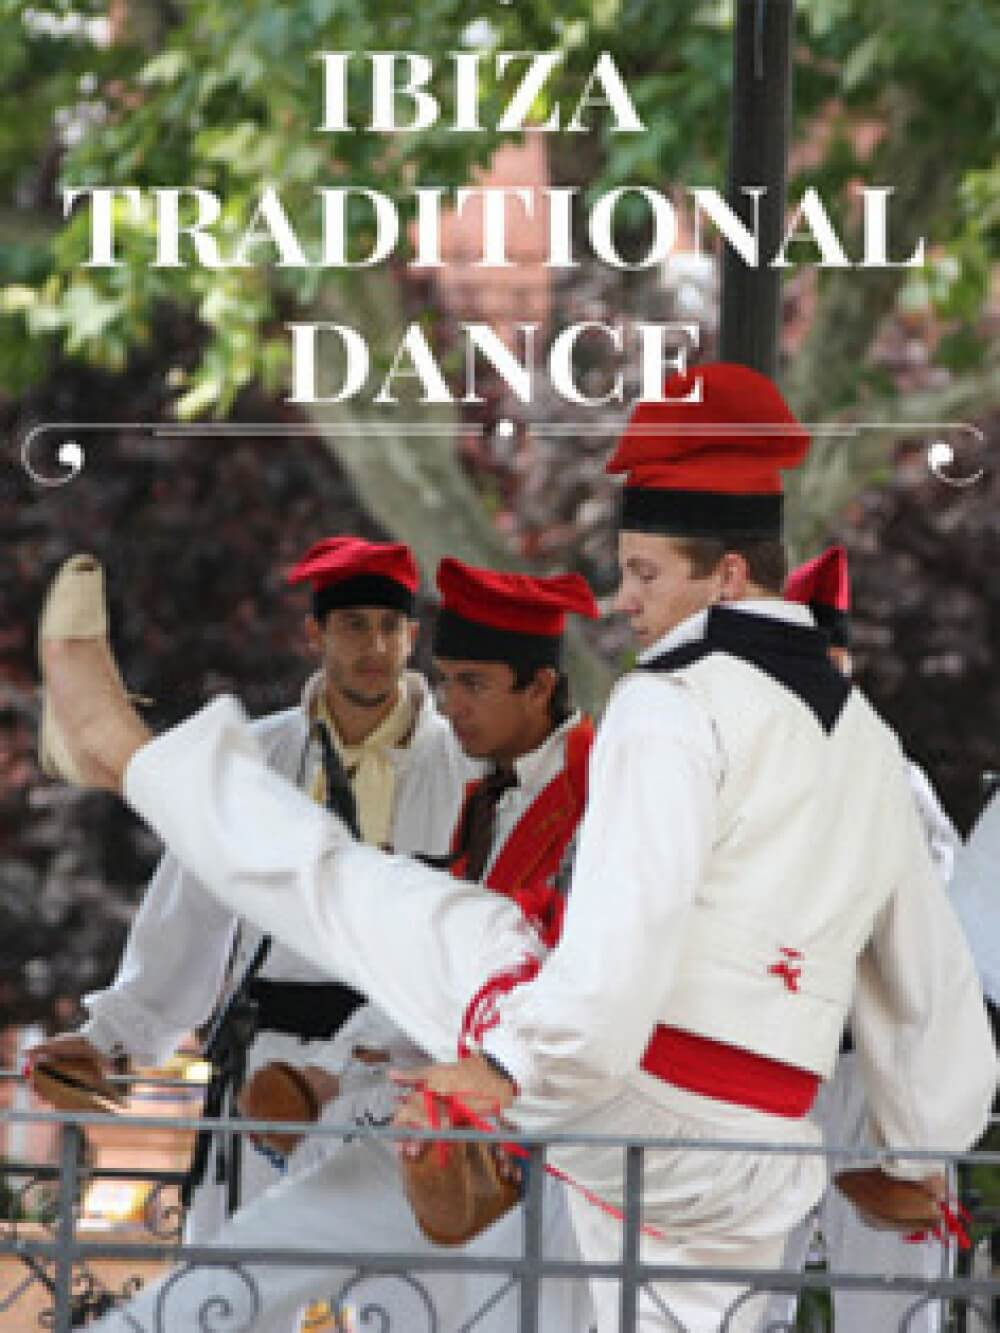 ibiza_traditional_dance_vertical_web